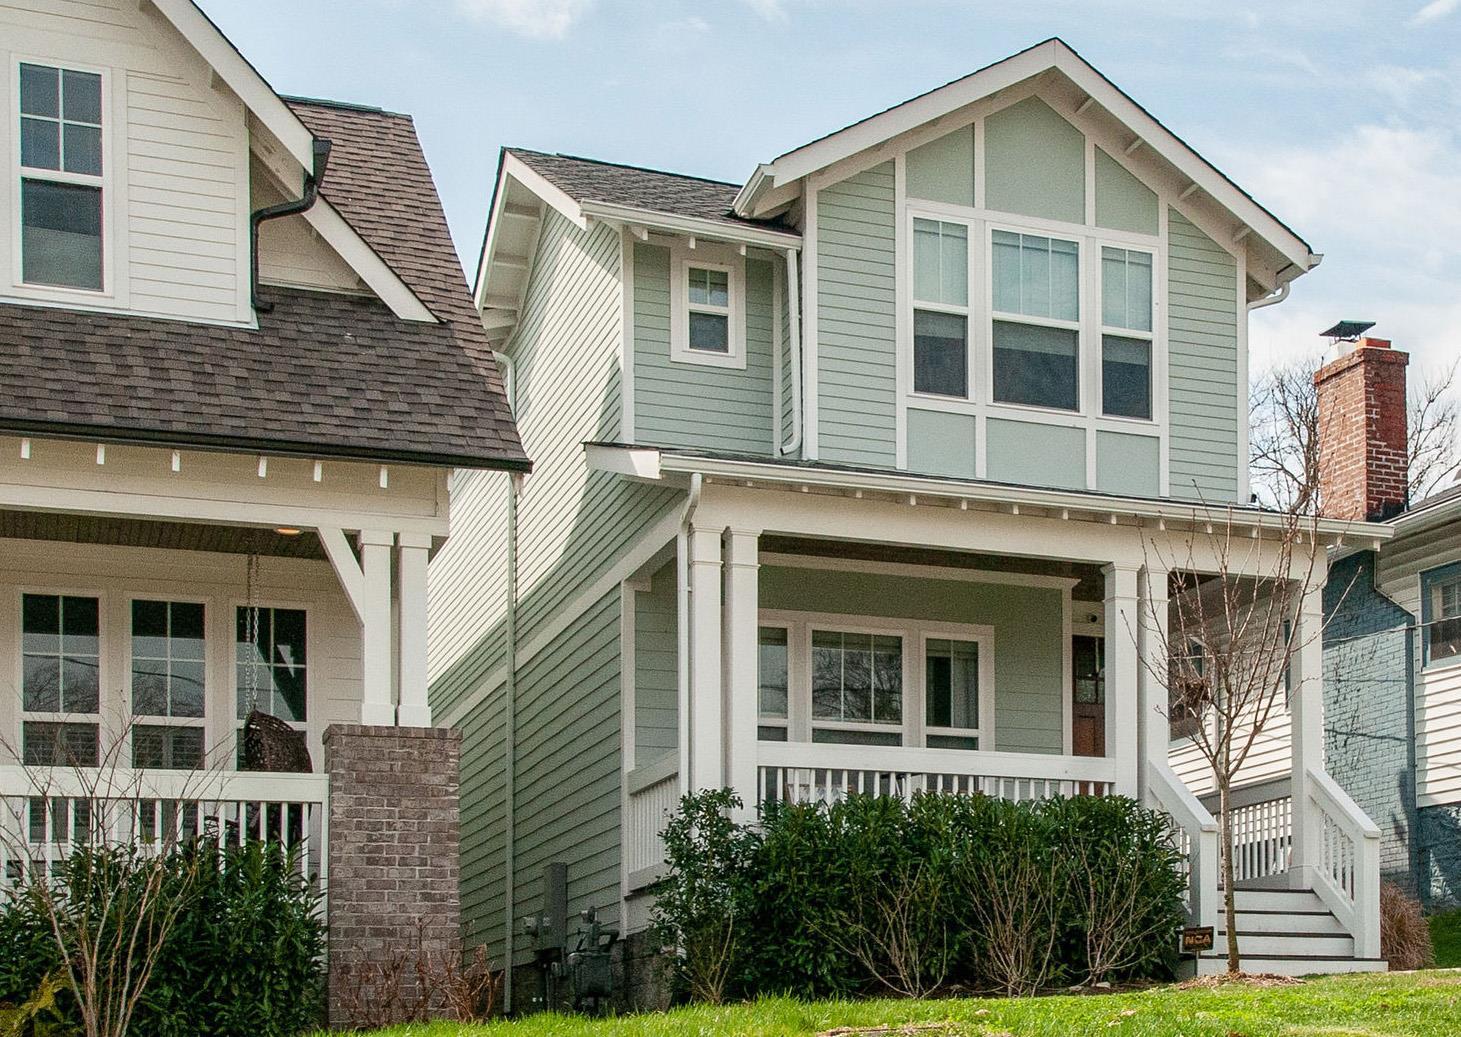 1015B Caldwell Ave, Nashville, TN 37204 - Nashville, TN real estate listing